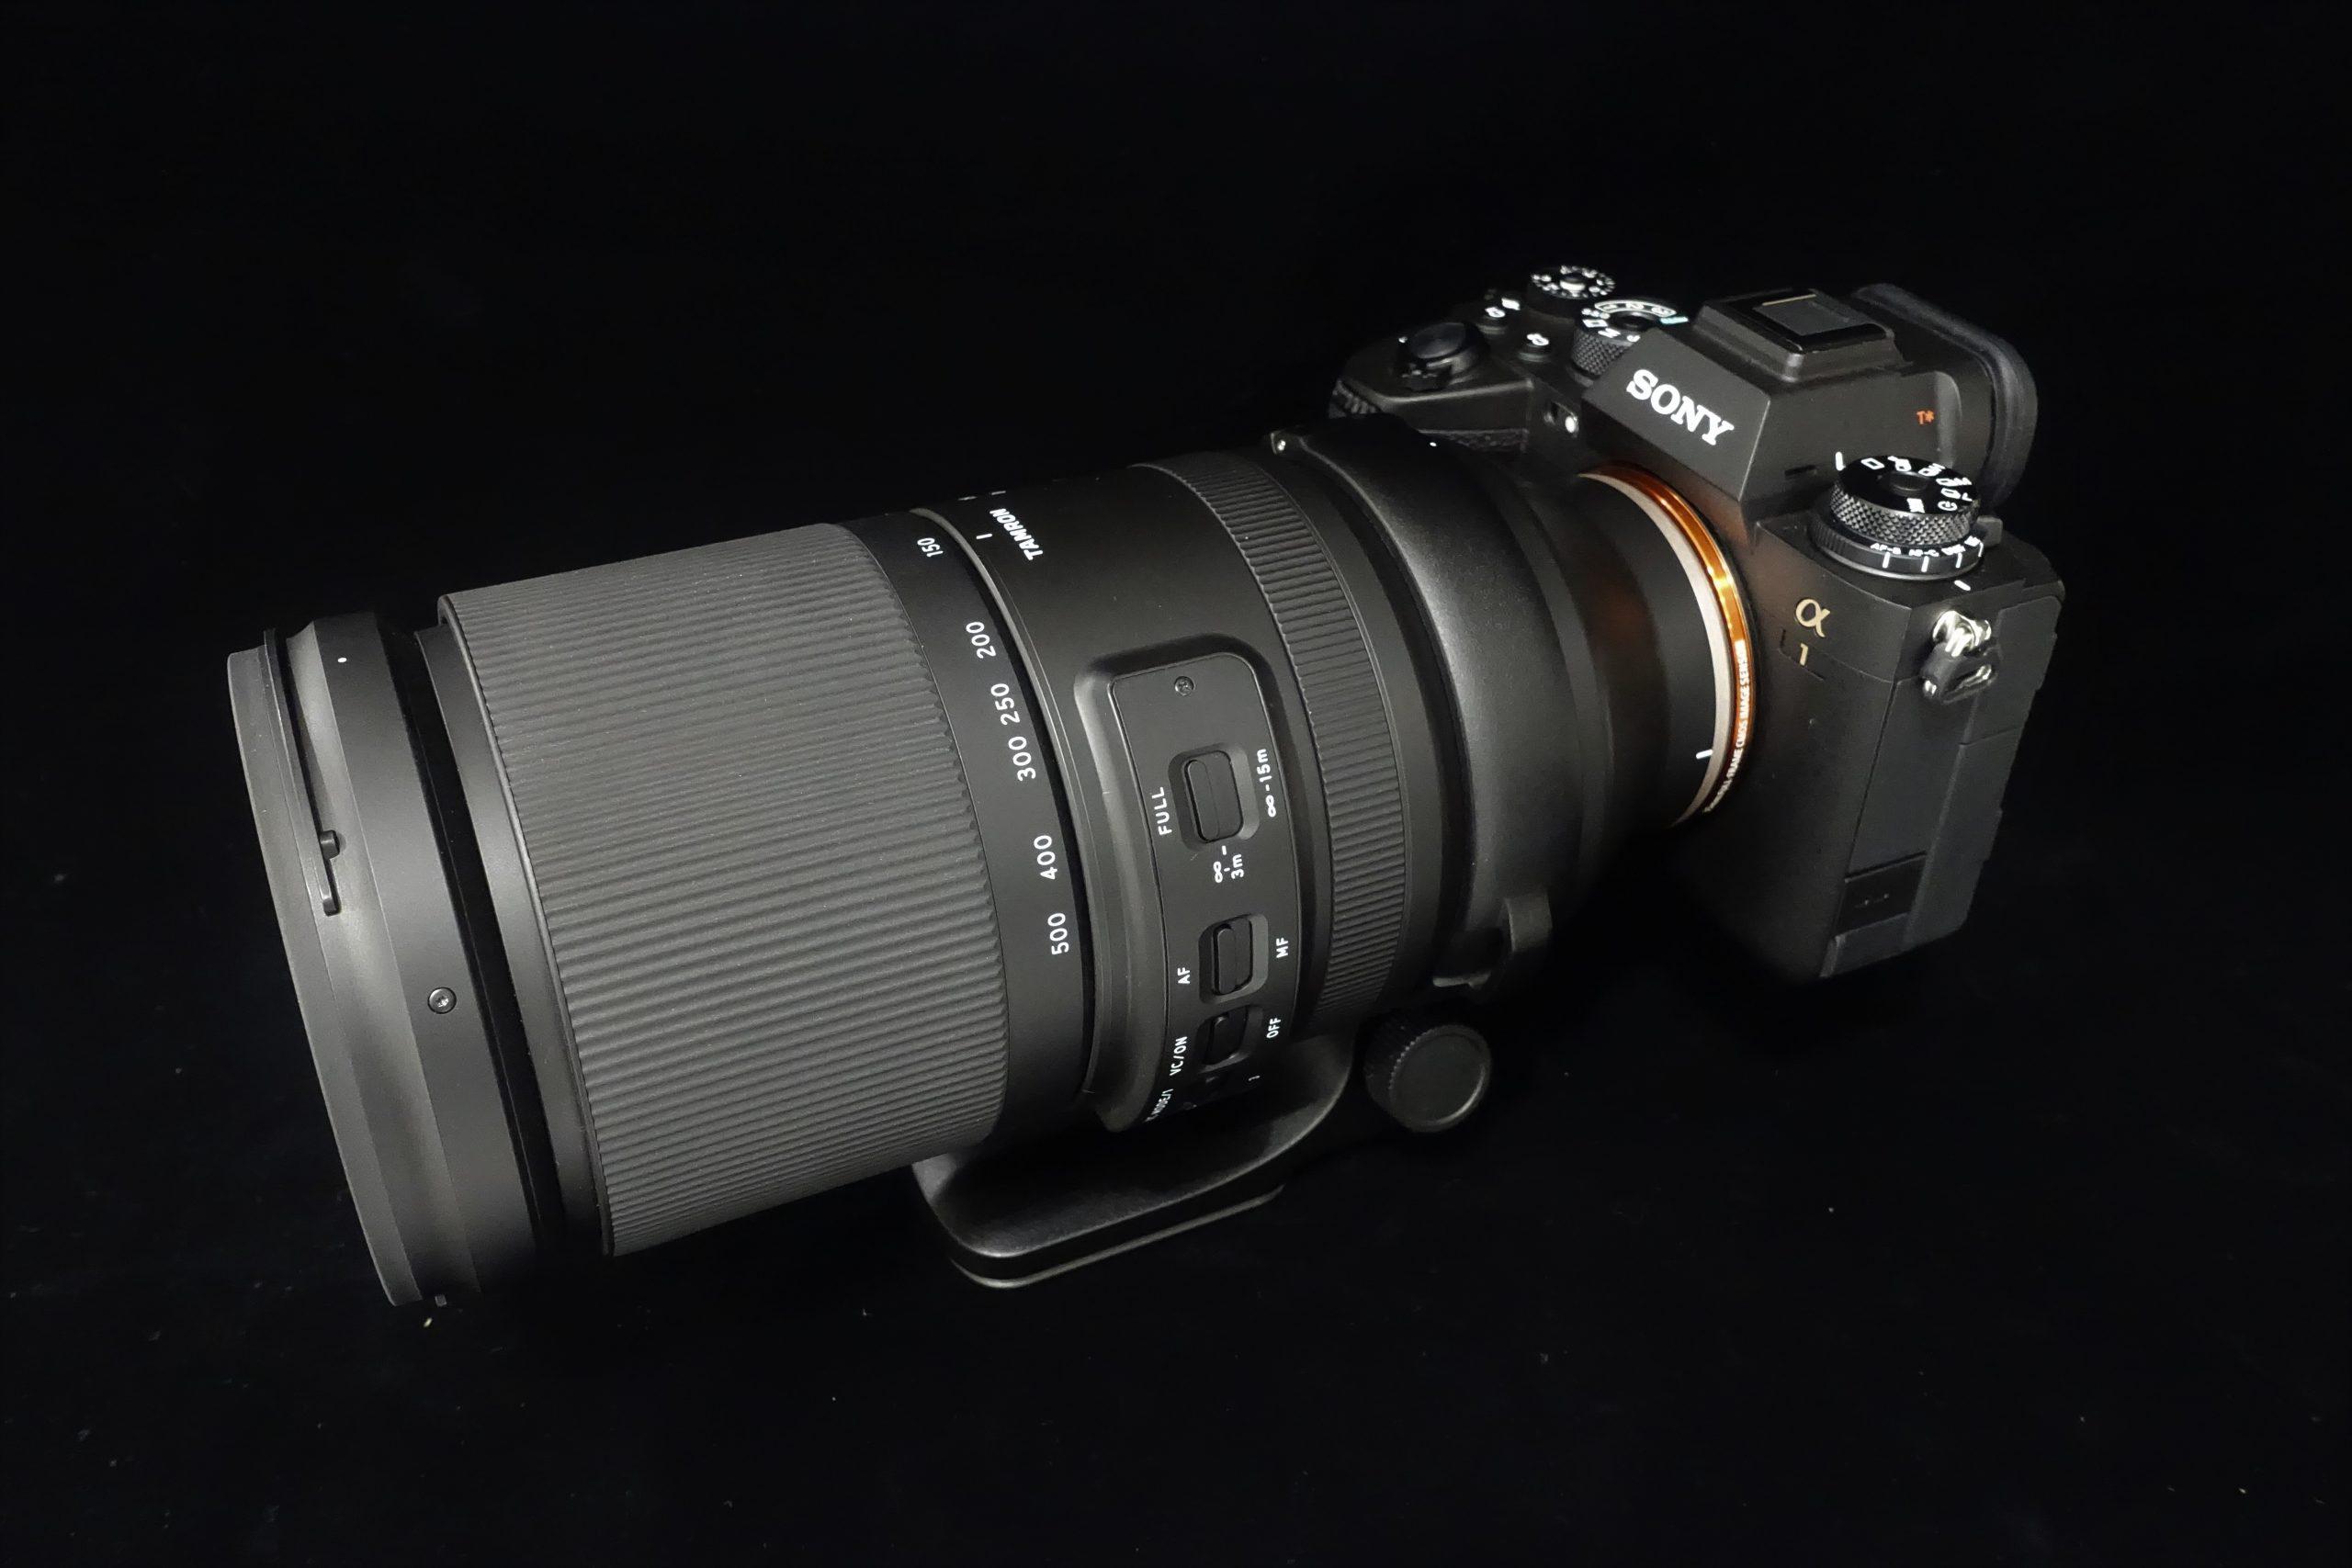 【TAMRON】150-500mm F5-6.7 DiIII VC VXD A057S【外観比較】